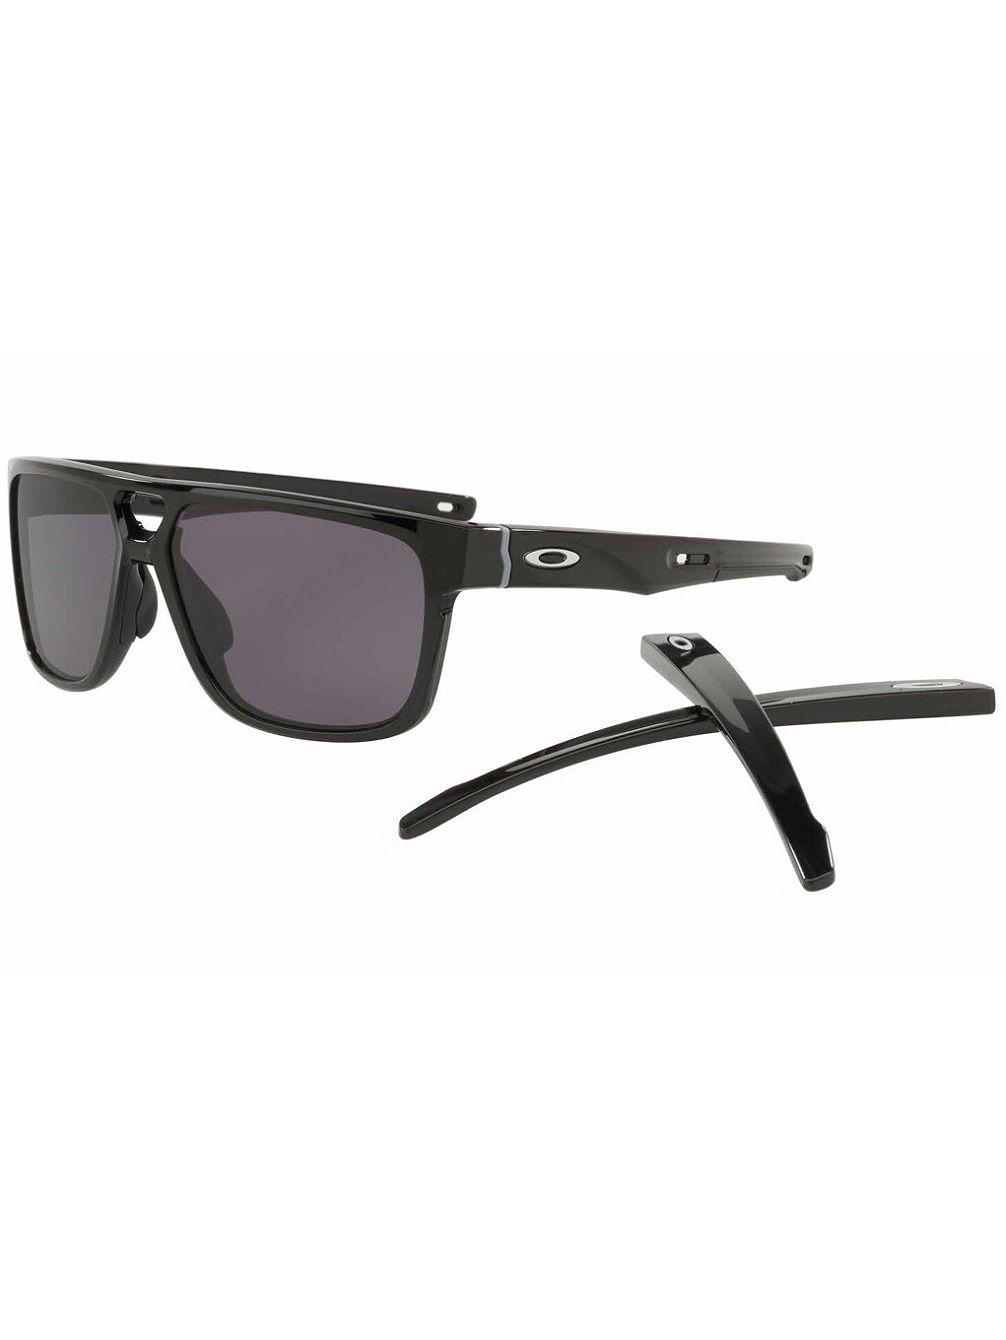 688168c99b Compra Oakley Crossrange Patch Matte Black Gafas de Sol en línea en Blue  Tomato